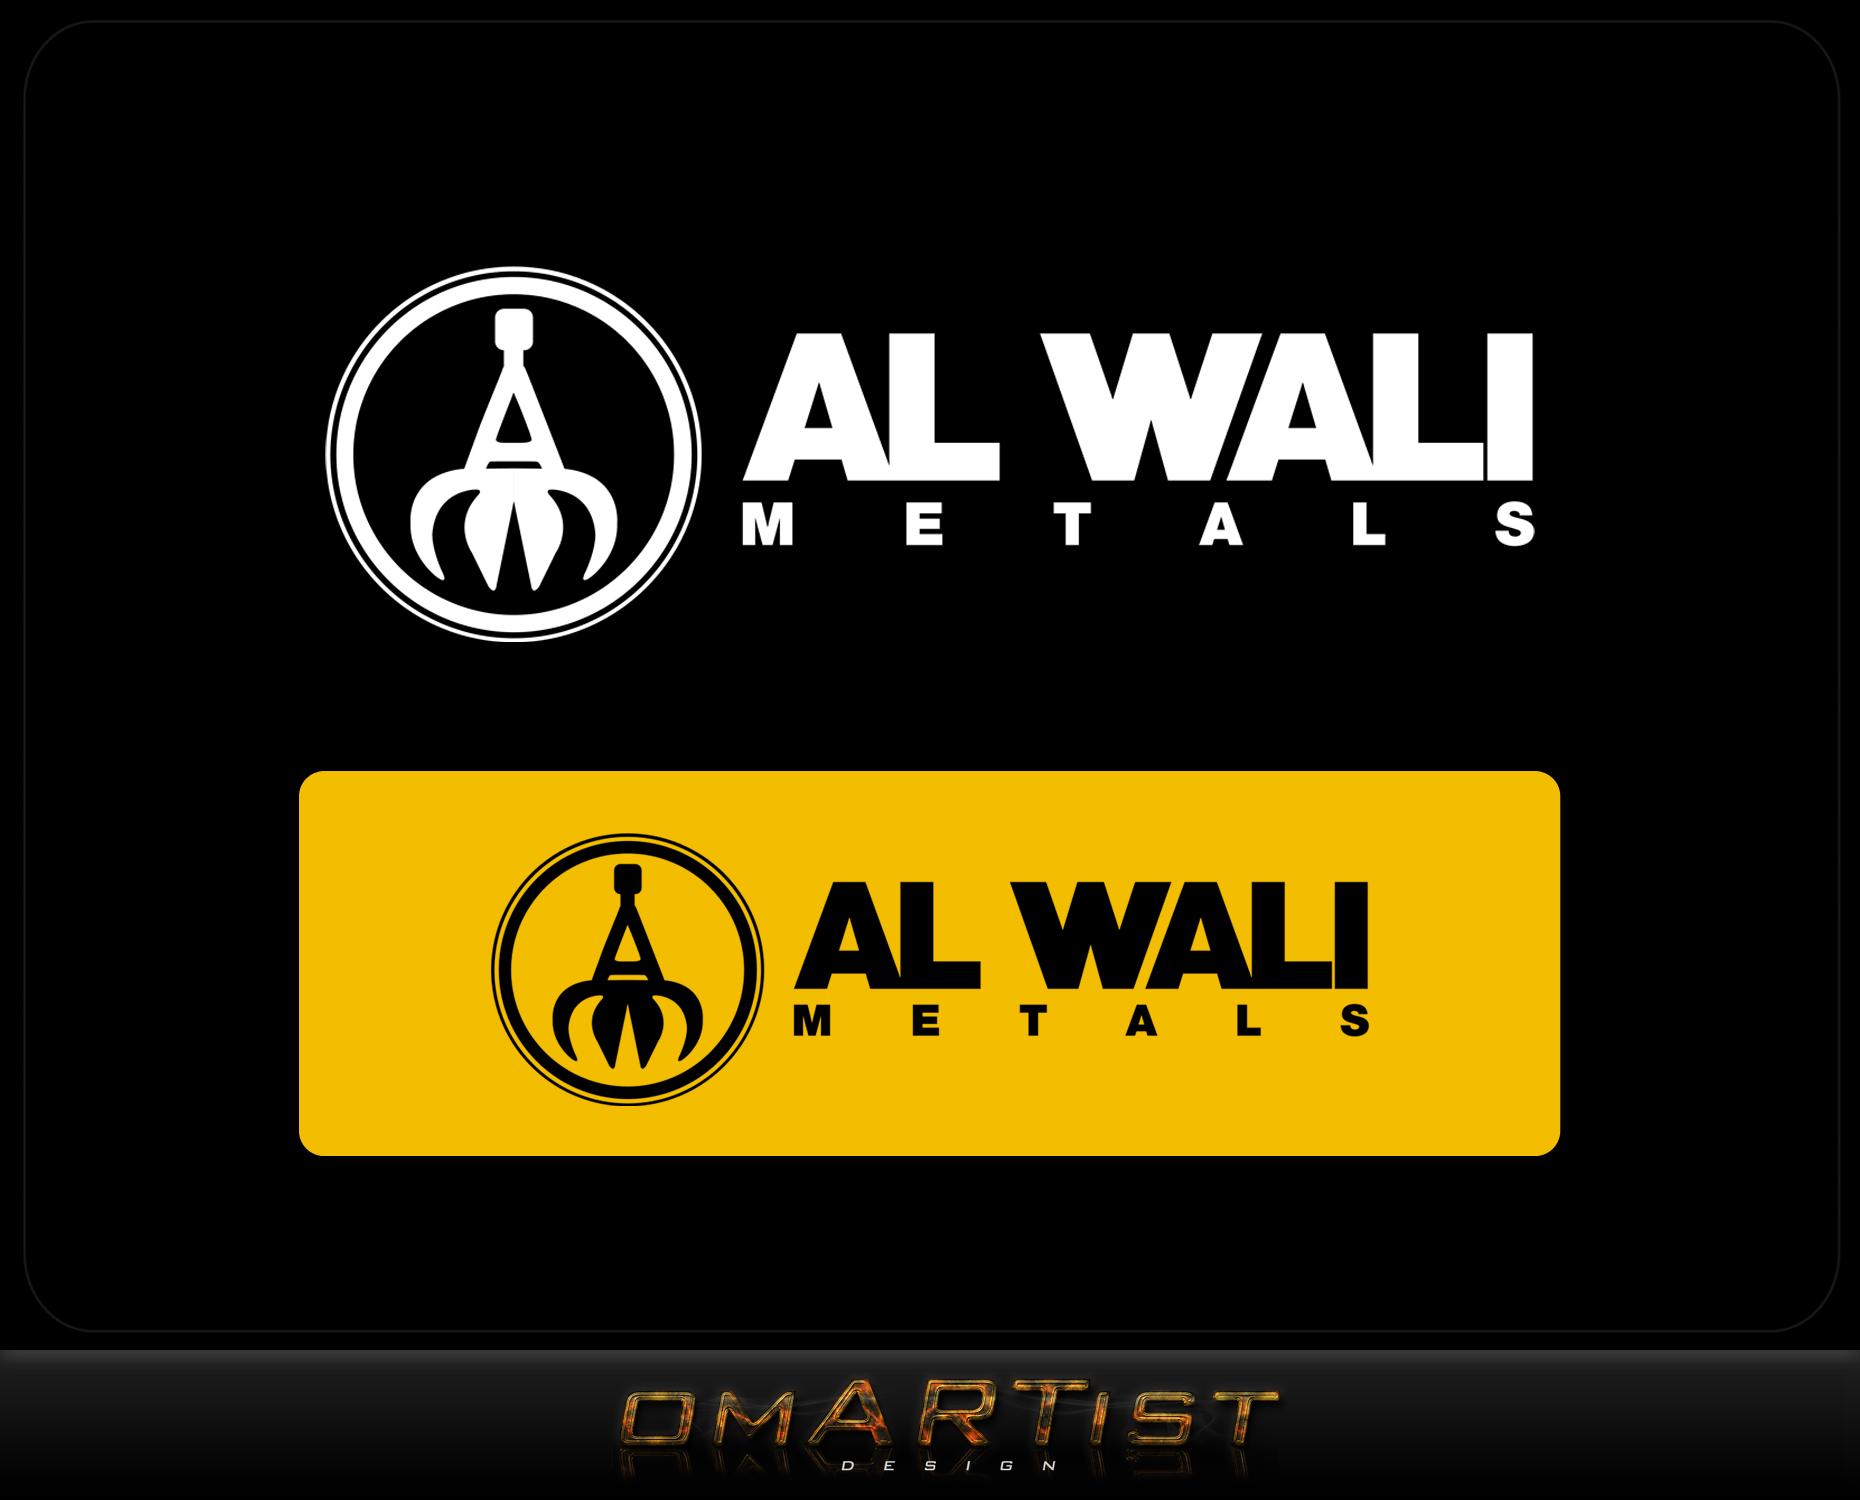 Logo Design by omARTist - Entry No. 105 in the Logo Design Contest Inspiring Logo Design for Al Wali Metals.